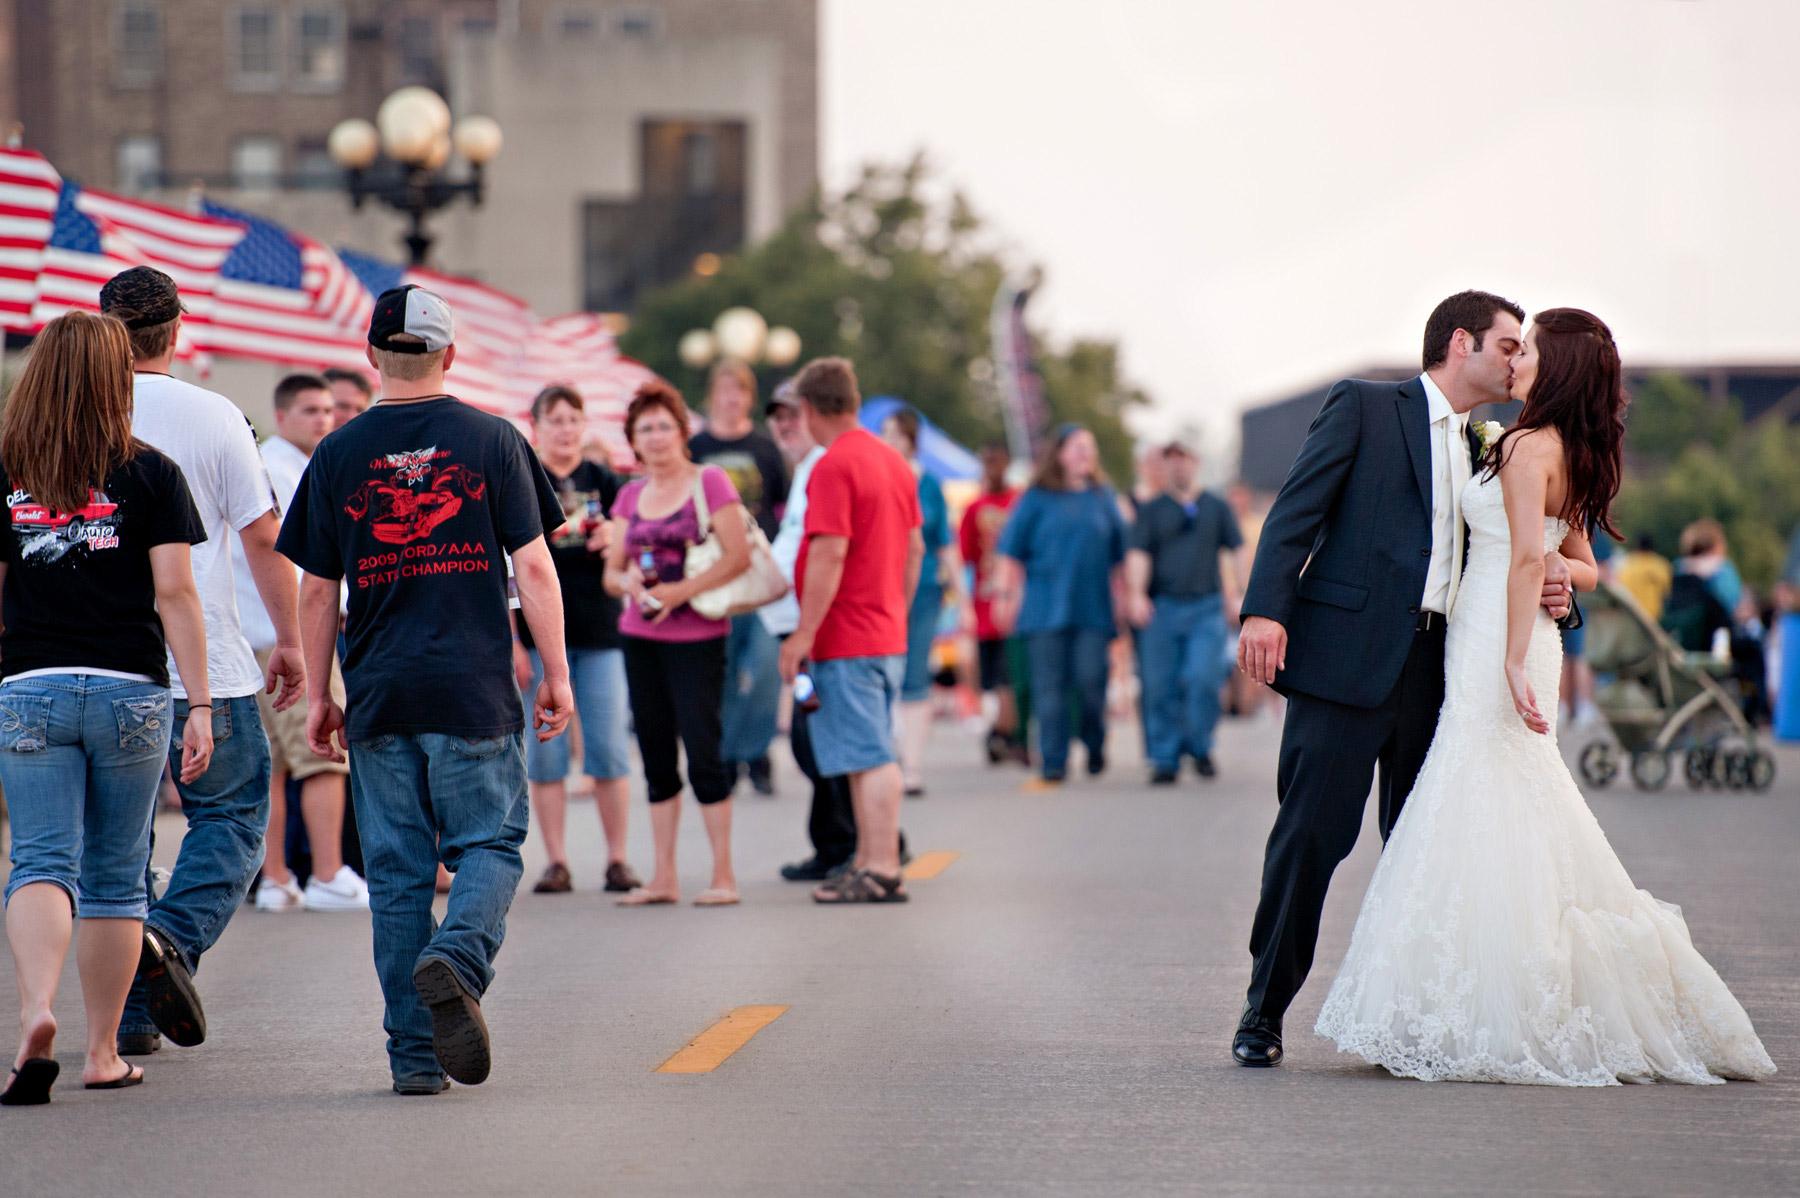 minnesota-wedding-photographers-mark-kegans-923.jpg